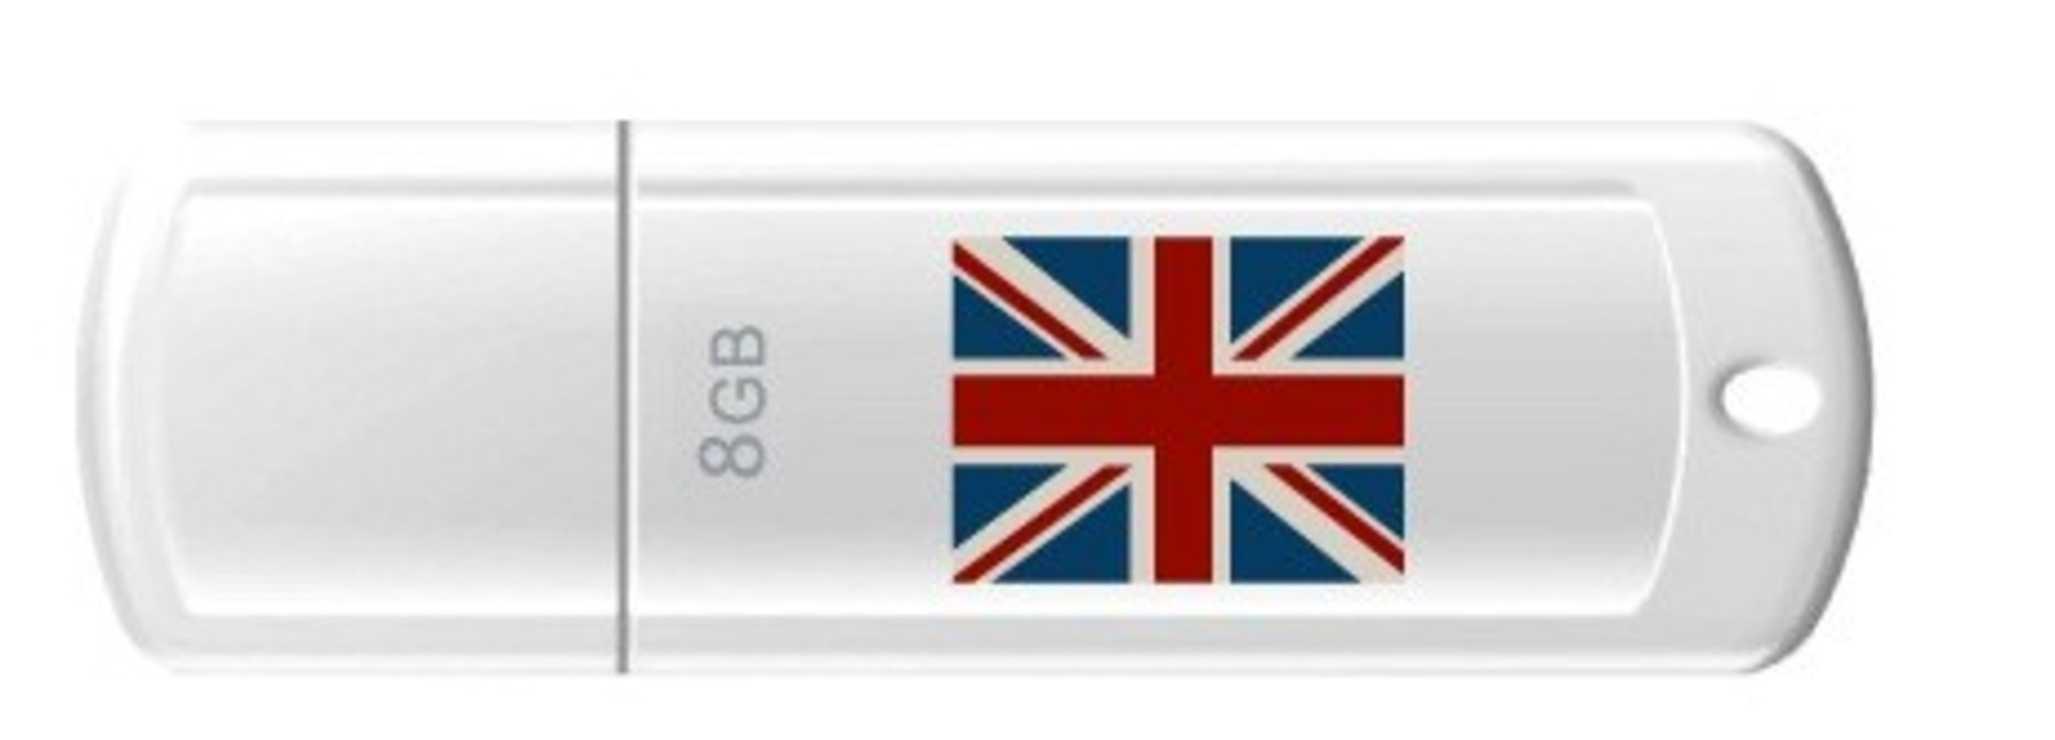 CLE USB 8 GO SERIE 370 BLANC USB 2.0 LOGO UNION JACK 0